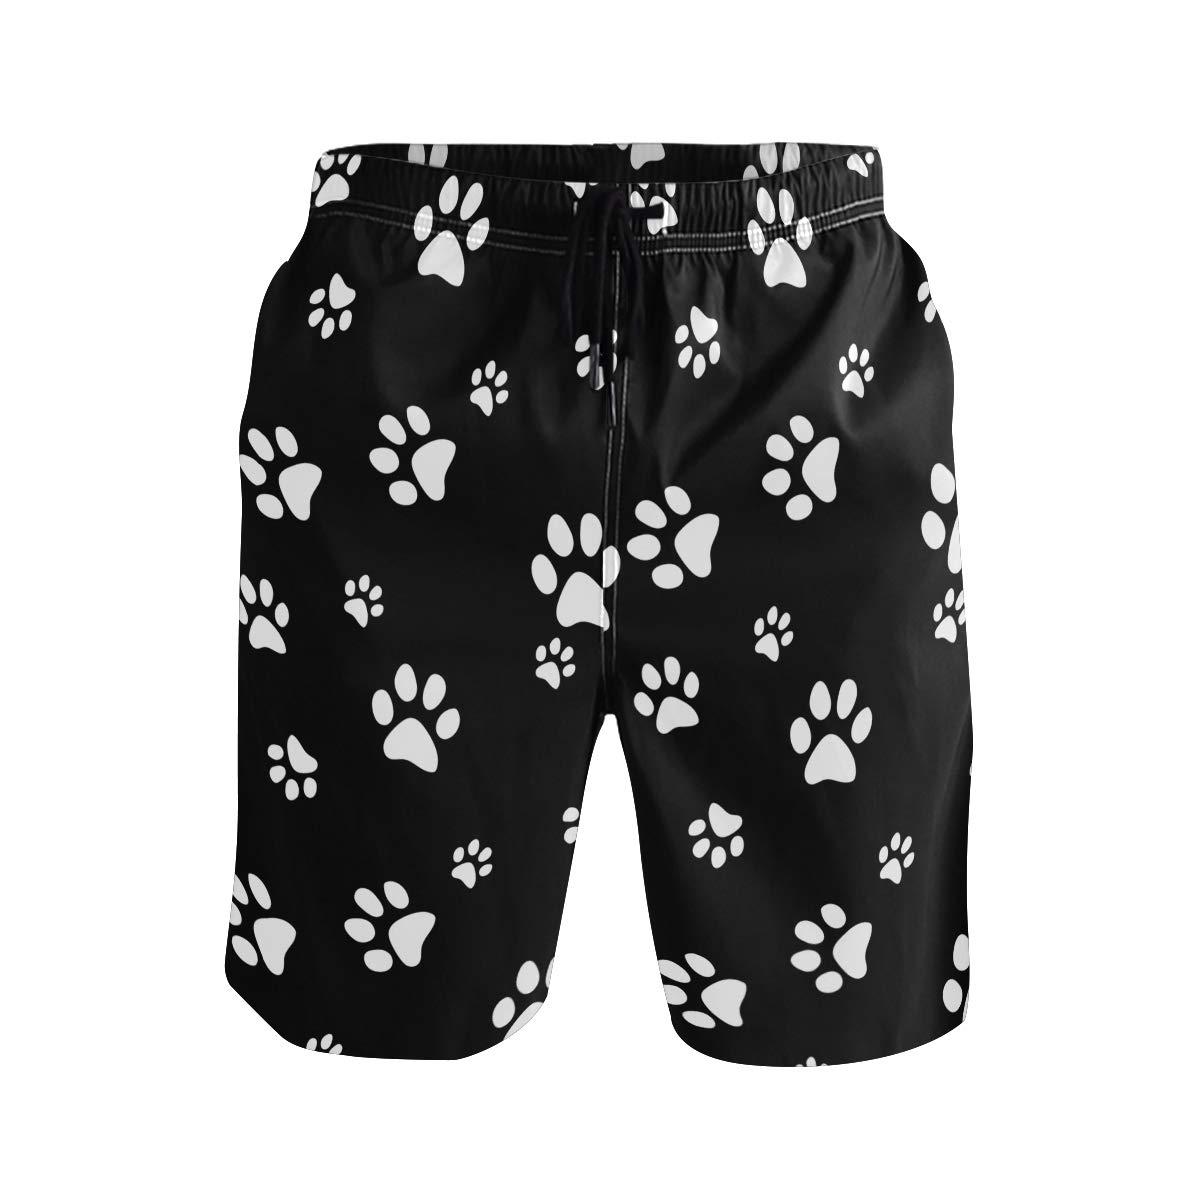 KUWT Mens Swim Trunks Animal Puppy Paw Print Quick Dry Beach Shorts Summer Surf Board Shorts